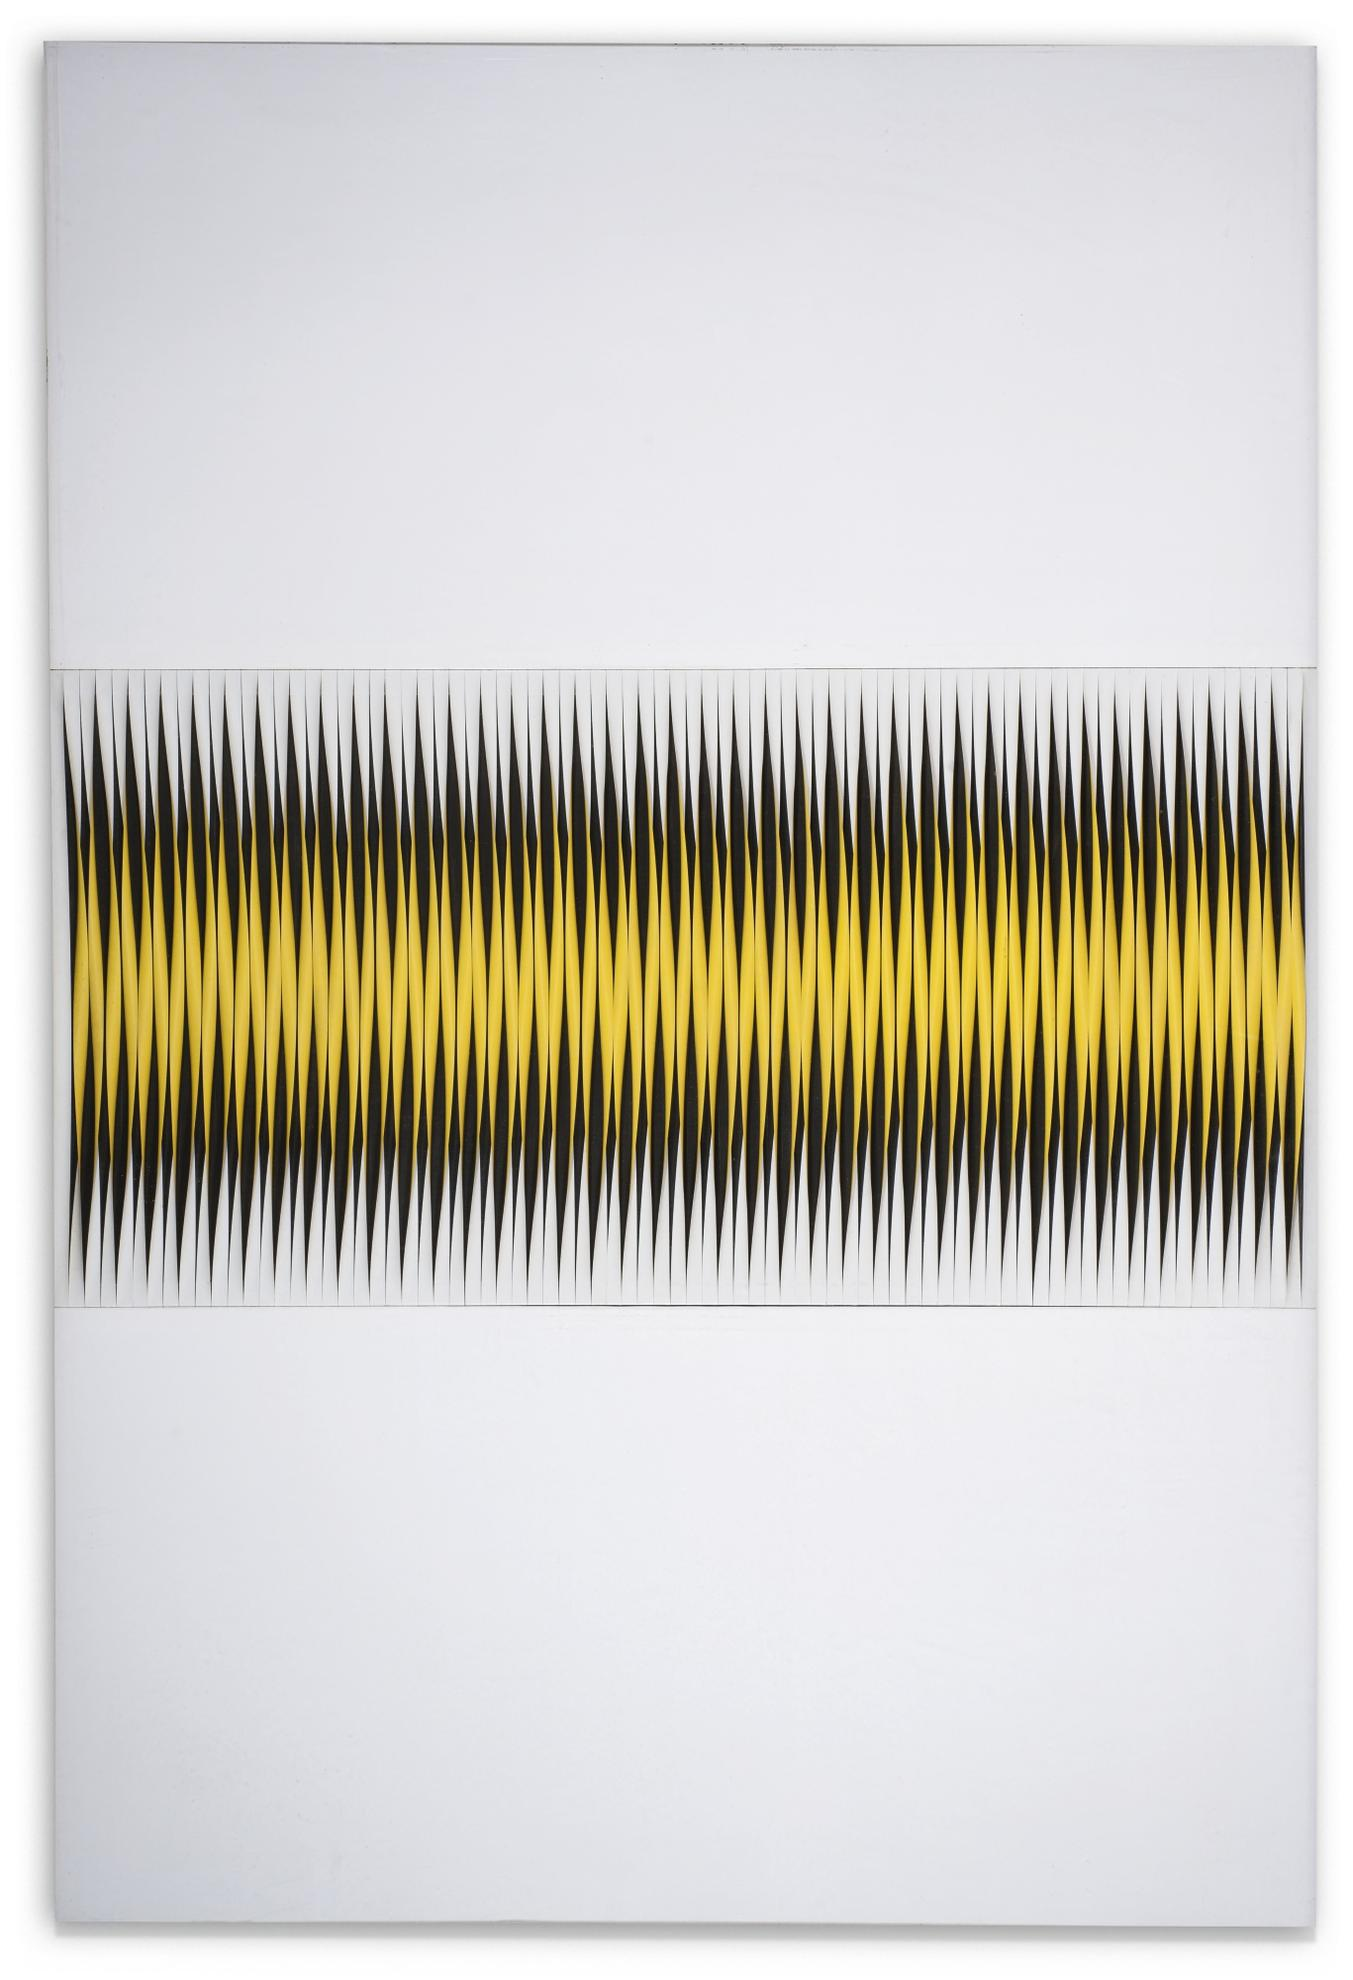 Walter Leblanc-Torsions Mobilo-Static C 54-1963